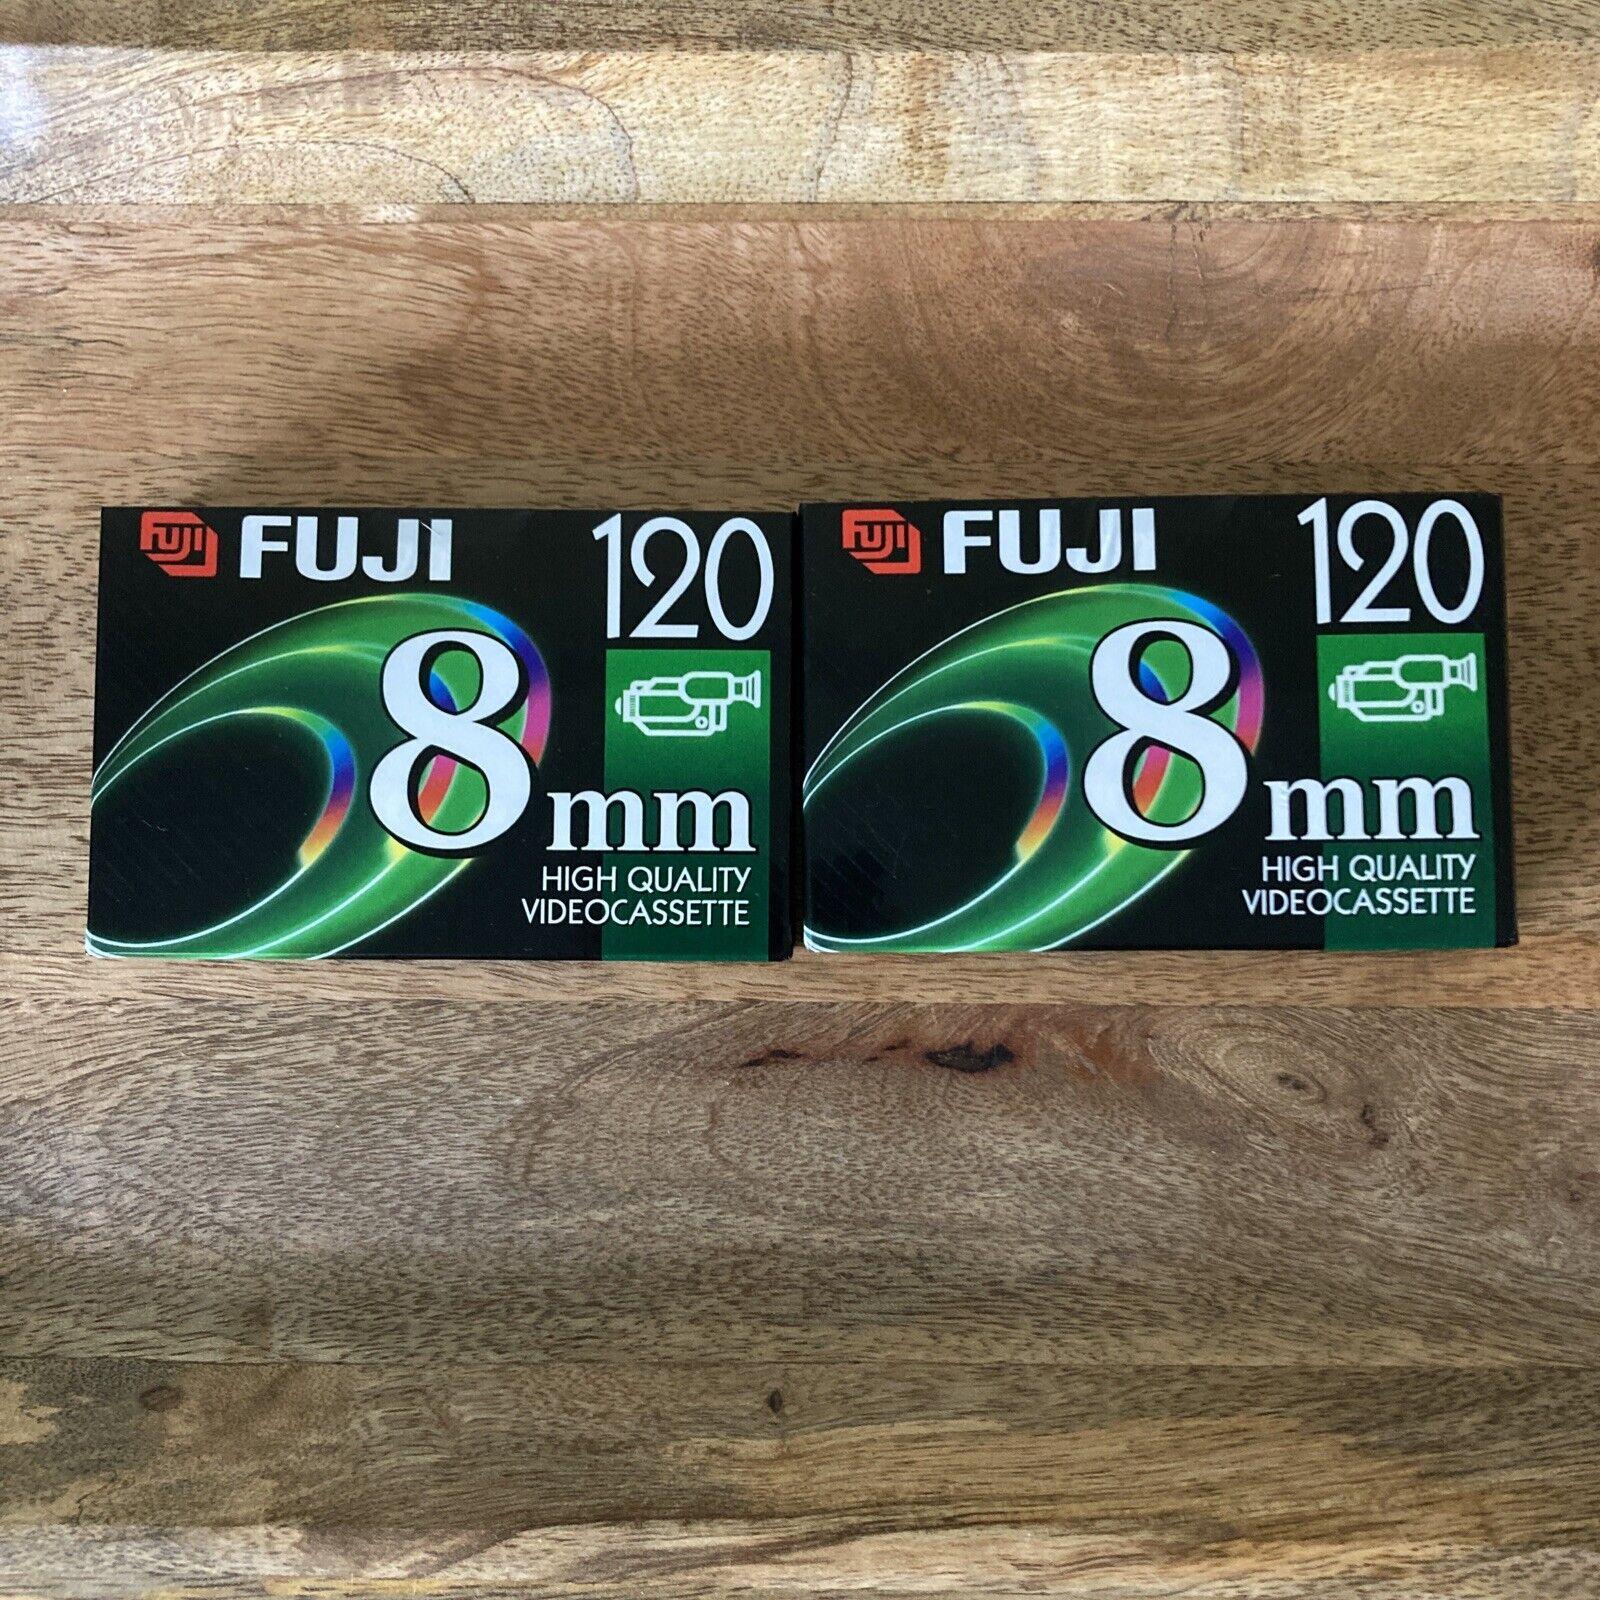 FUJI 8mm 120 P6-120 High Quality Video Cassette Lot of 2